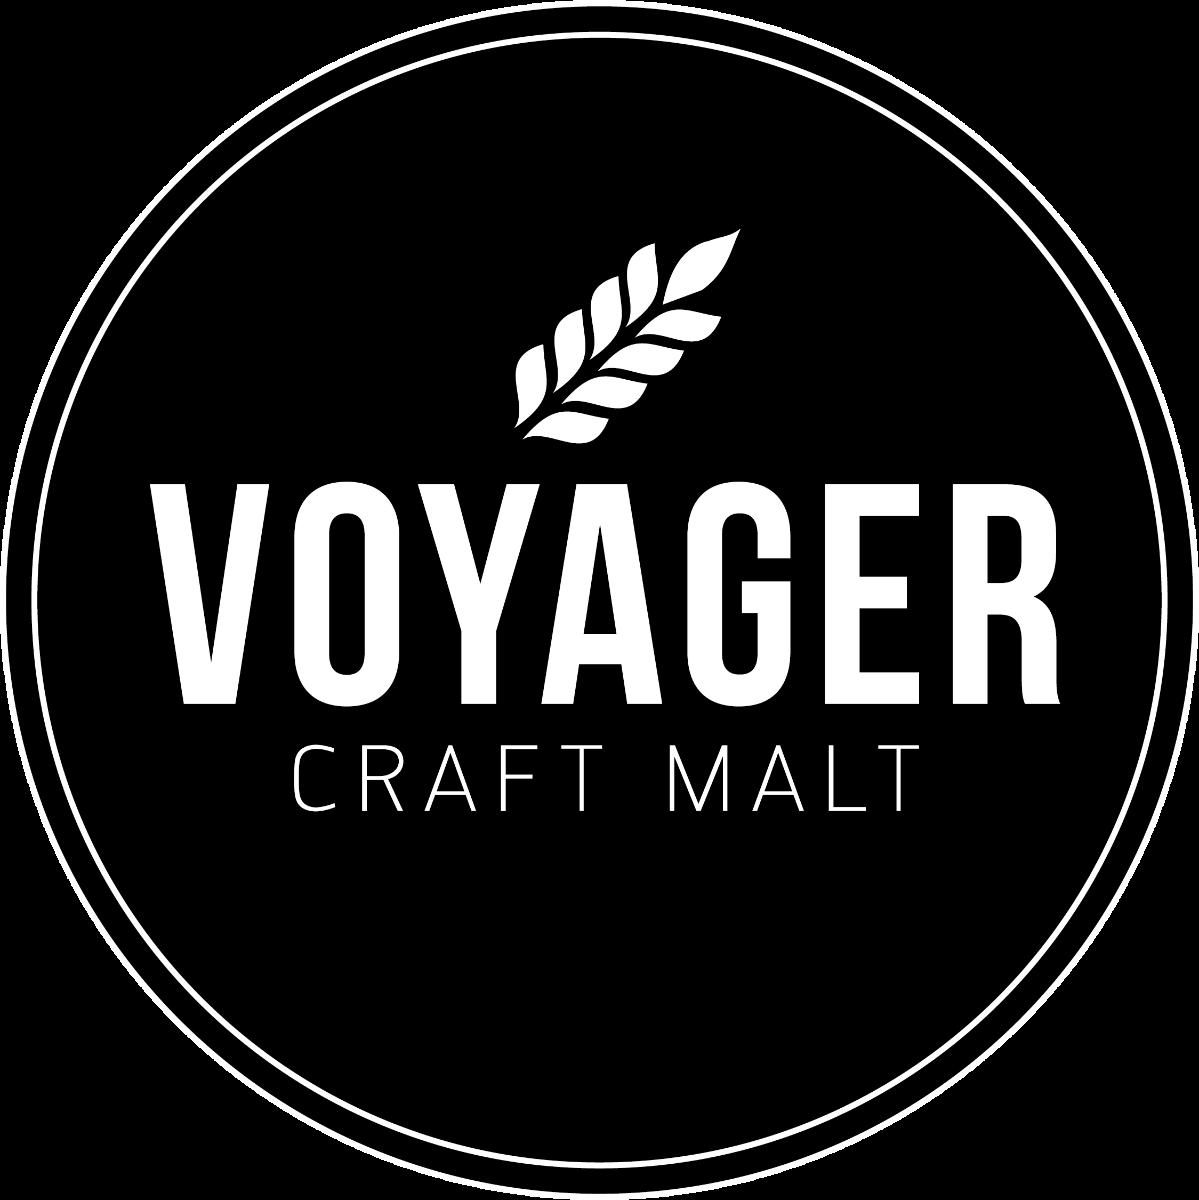 Voyager Biscuit Malt